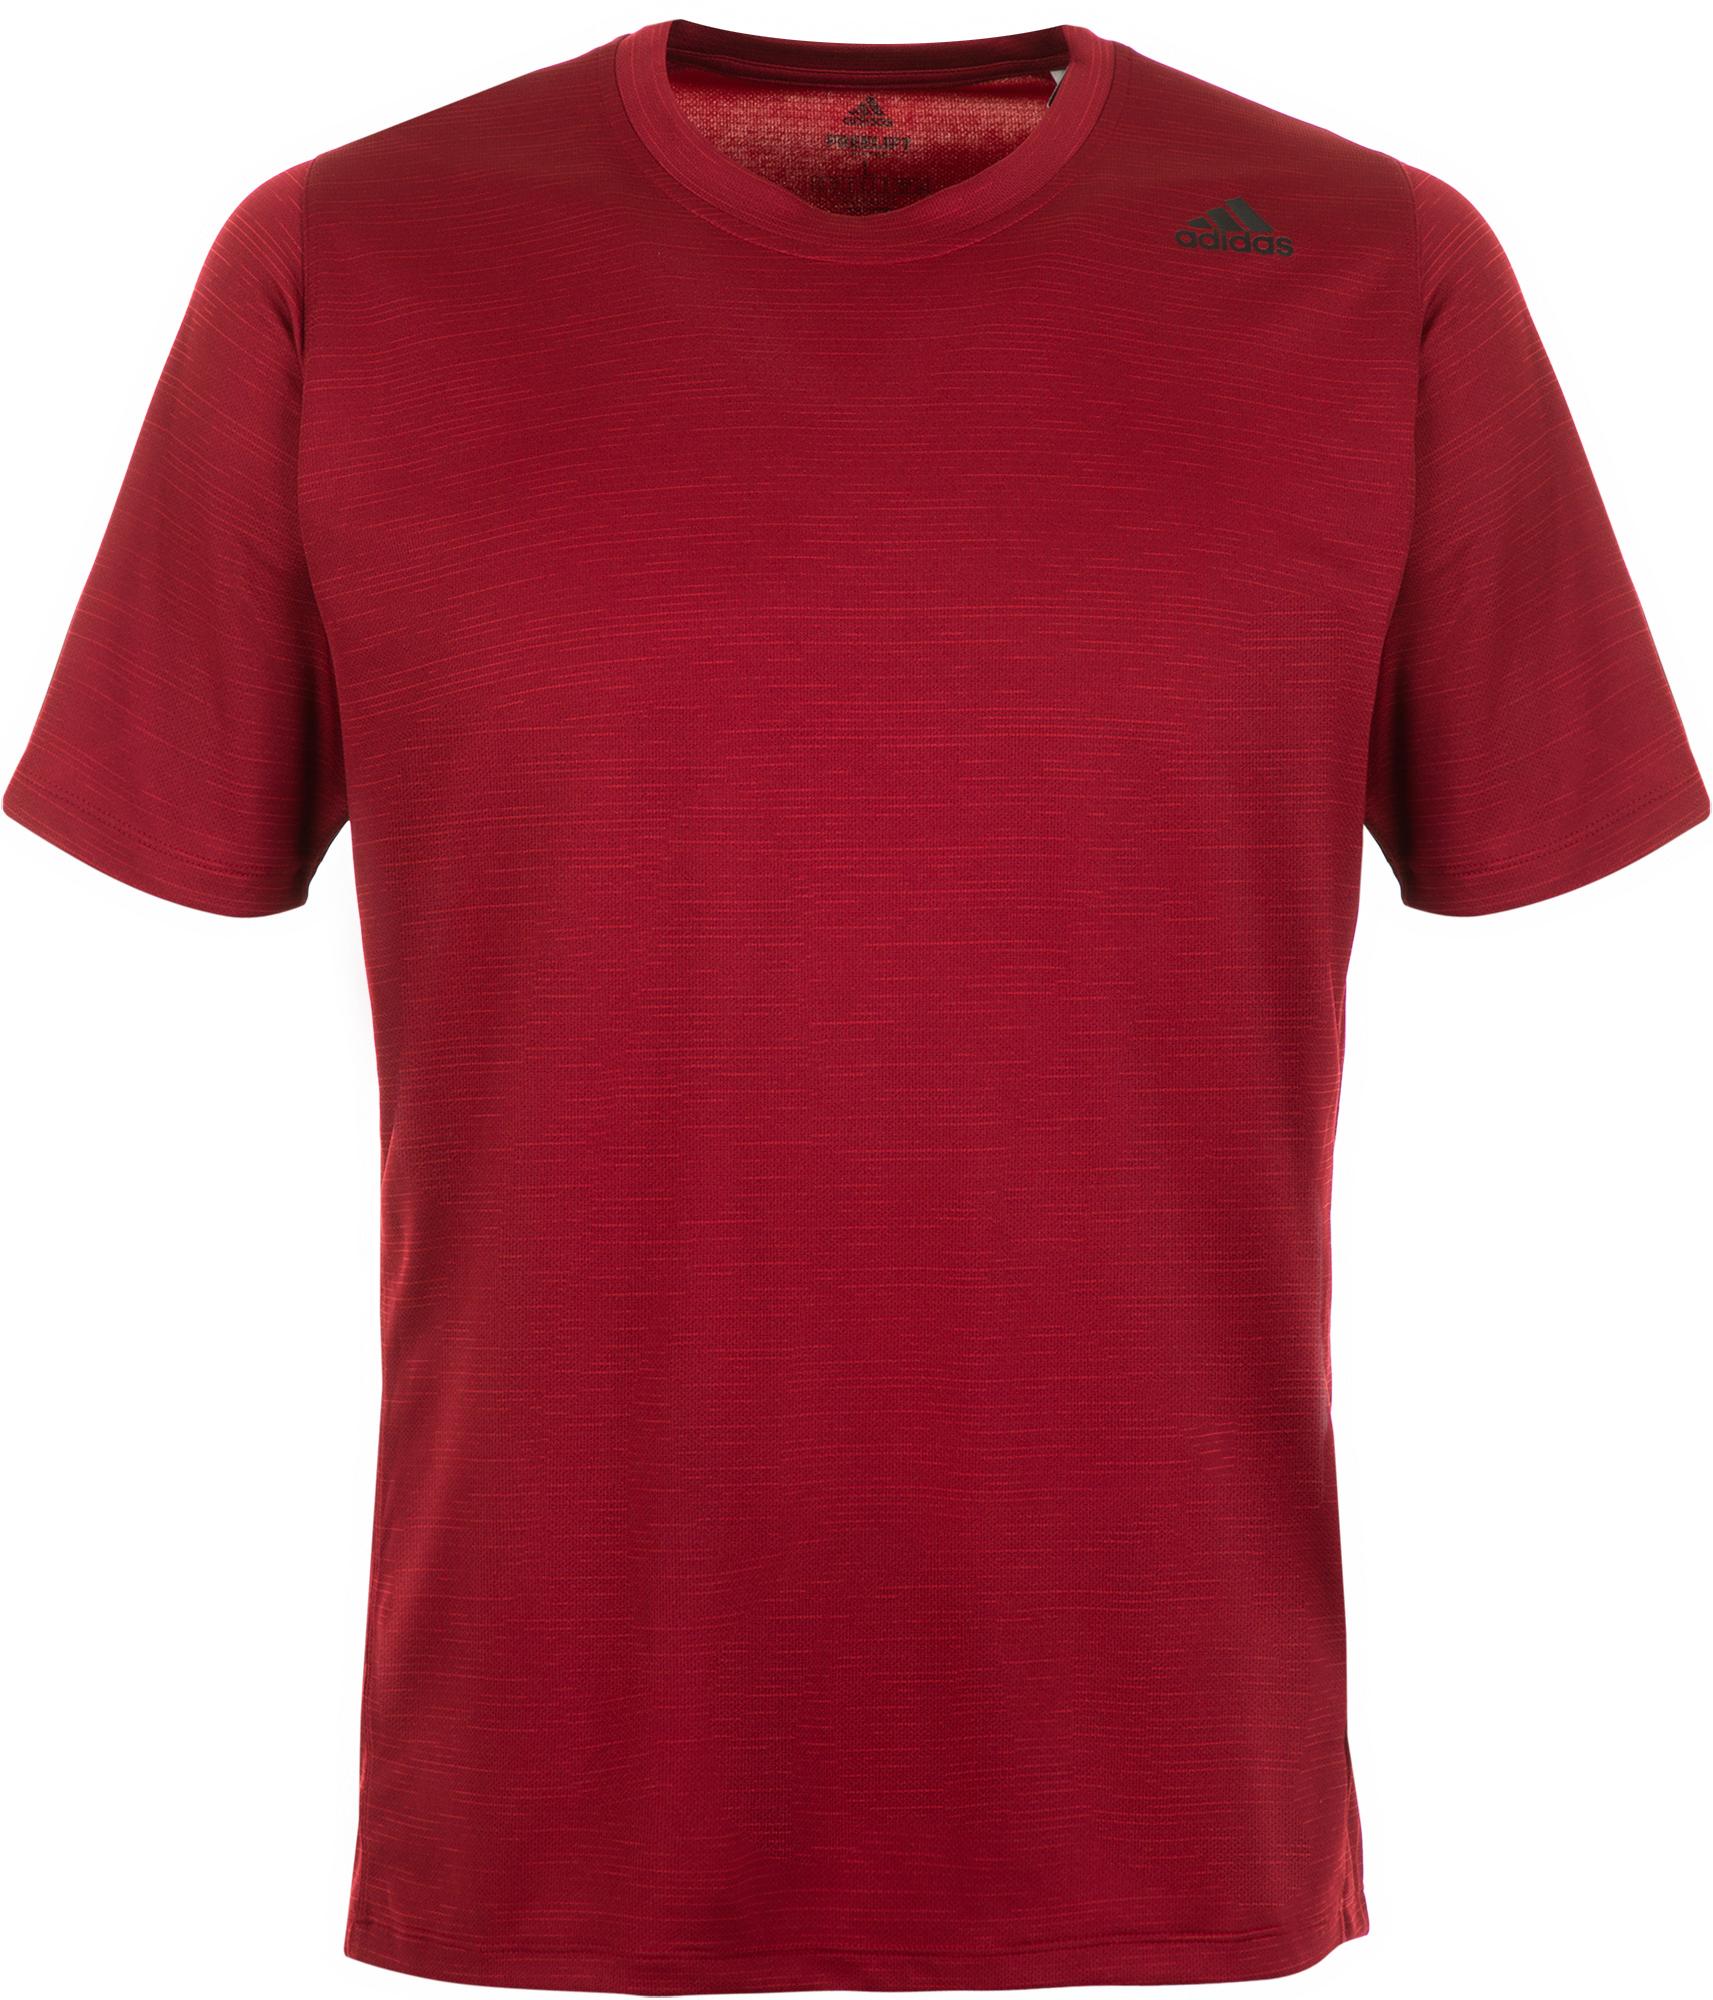 Adidas Футболка мужская FreeLift Tech, размер 54